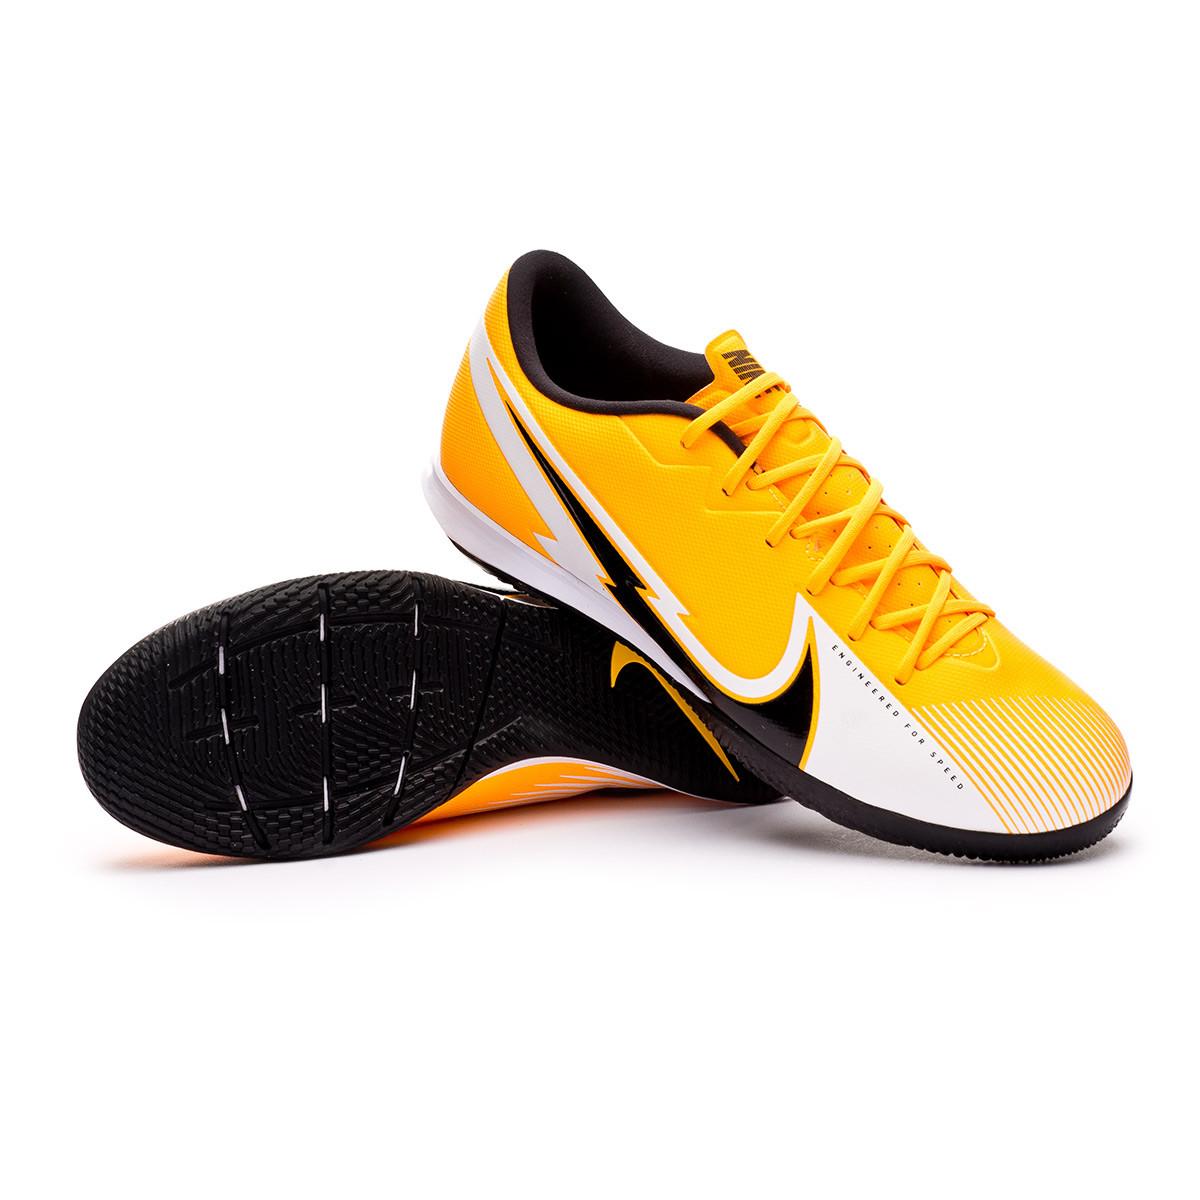 Chaussure de futsal Nike Mercurial Vapor XIII Academy IC Laser ...